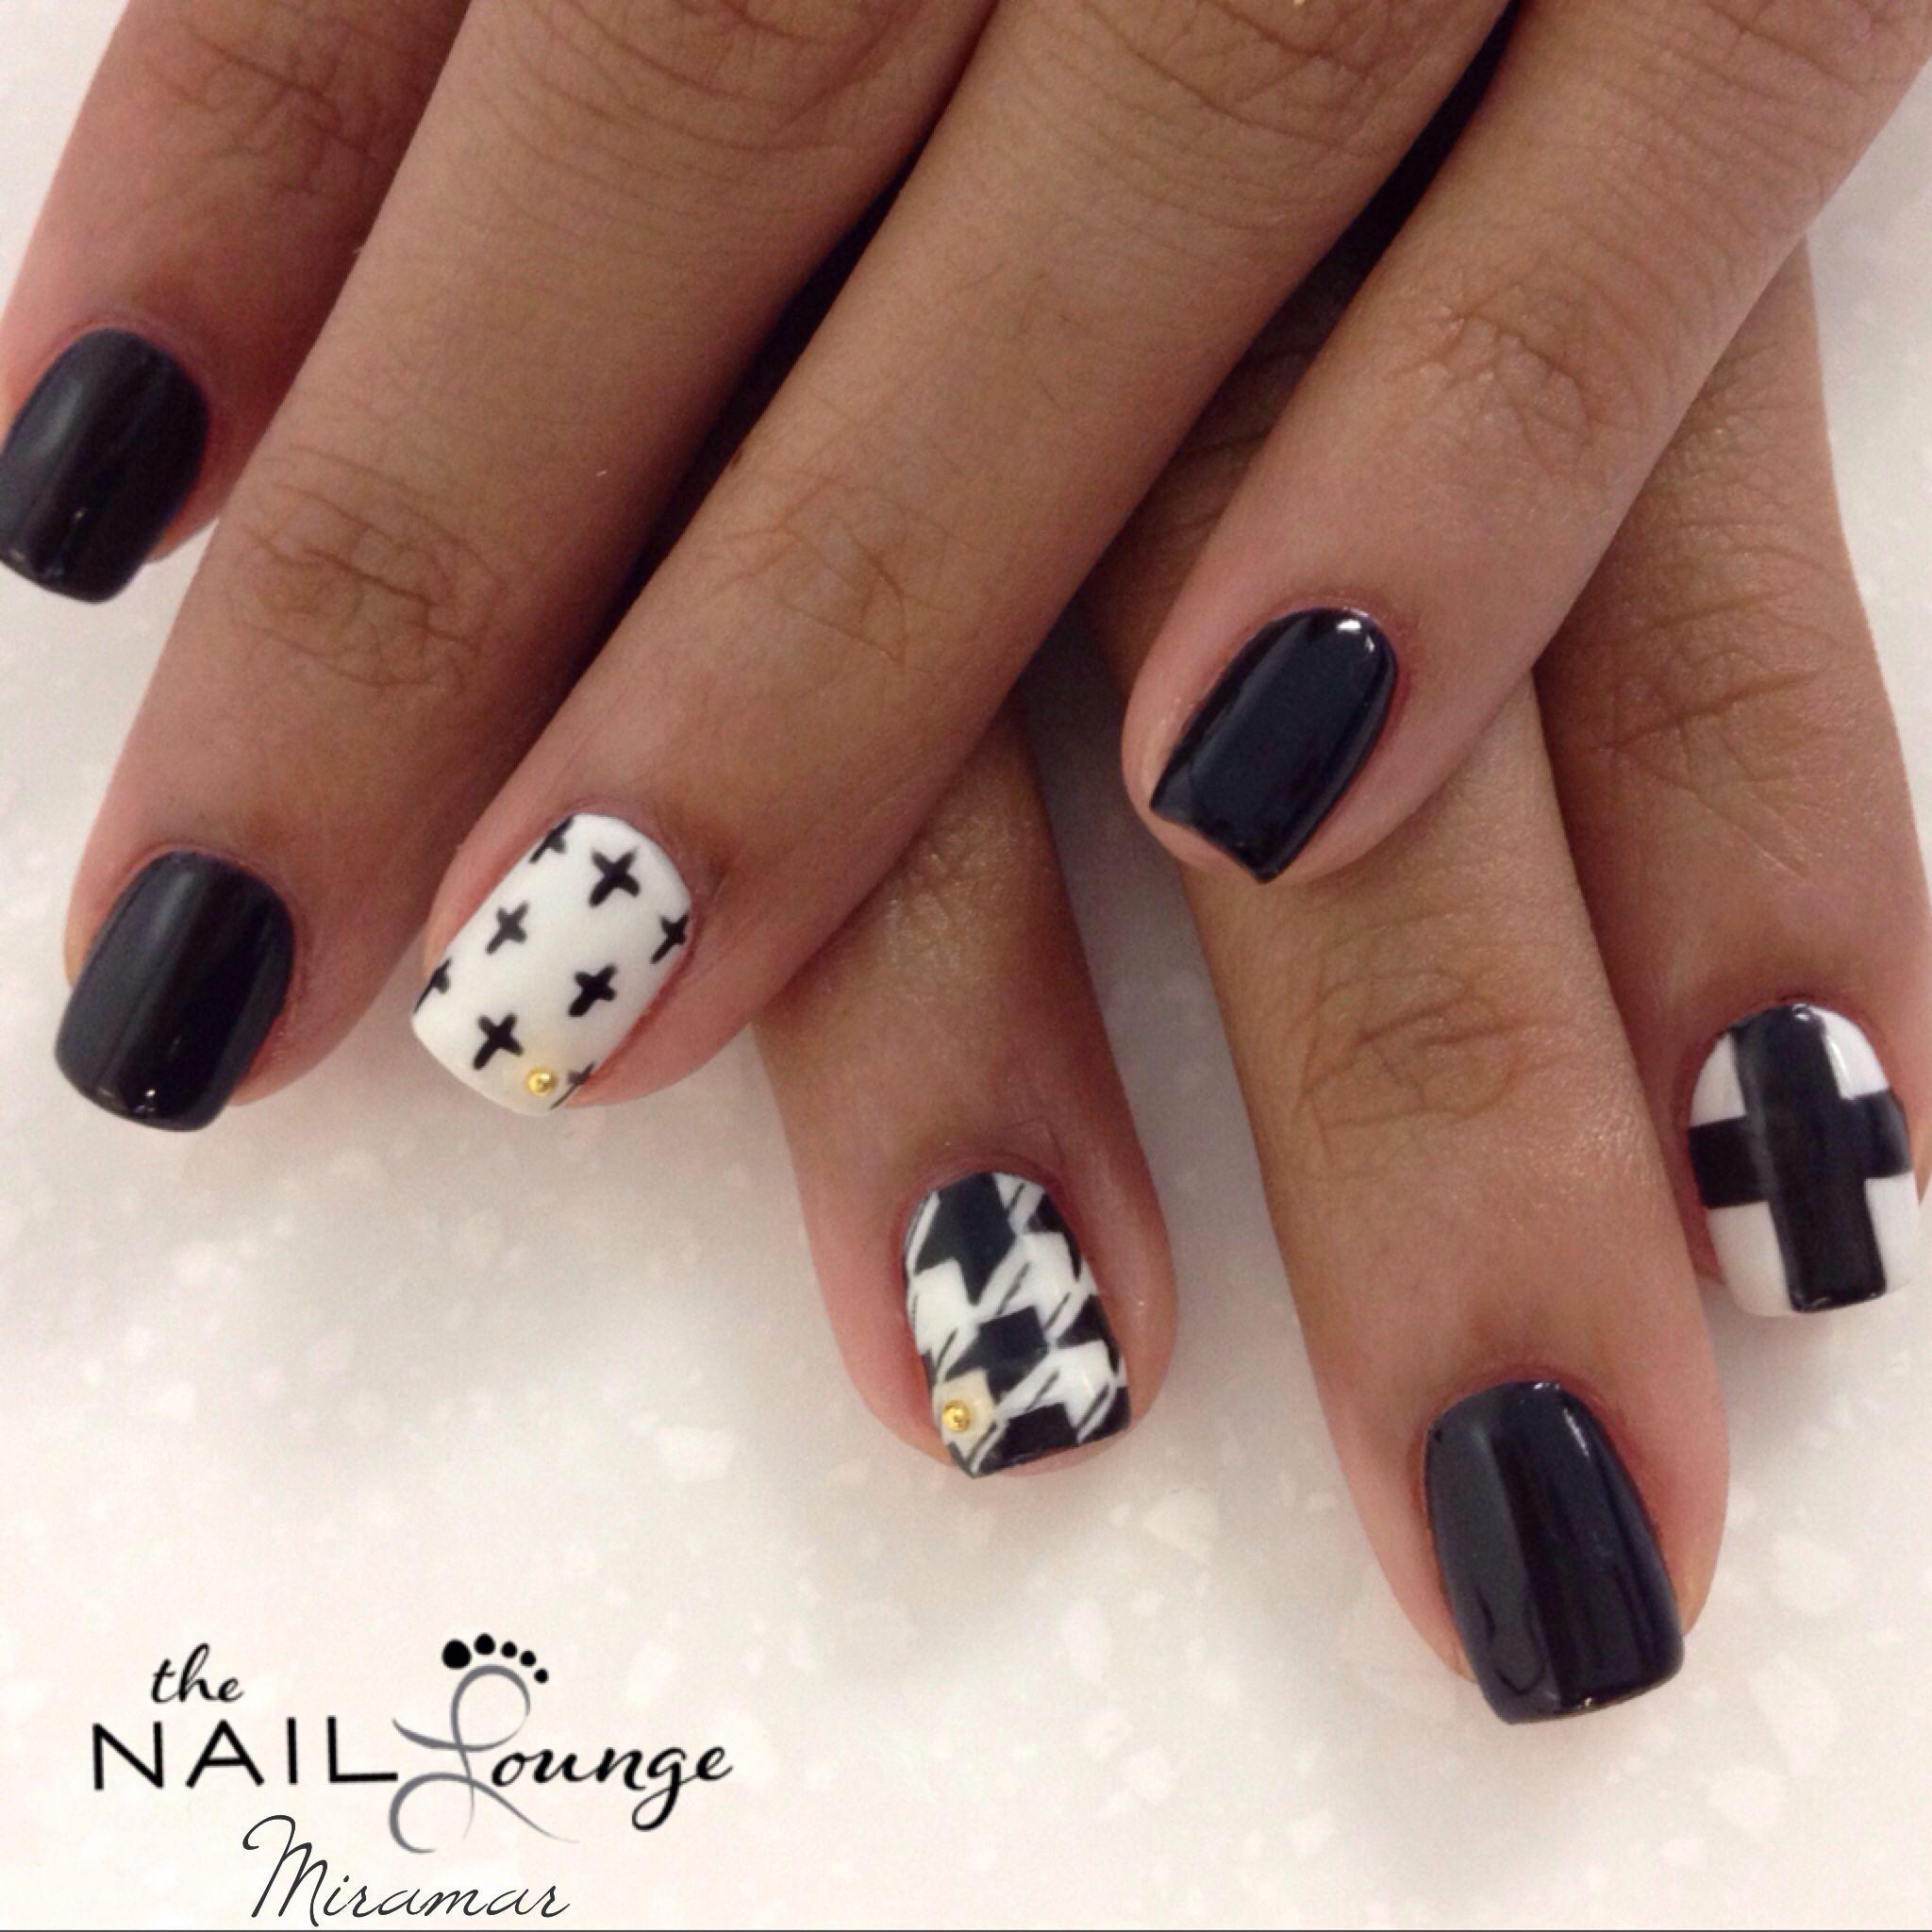 Pin By The Nail Lounge On Nail Art Matte Gel Nails Black And White Nail Art Gel Nails